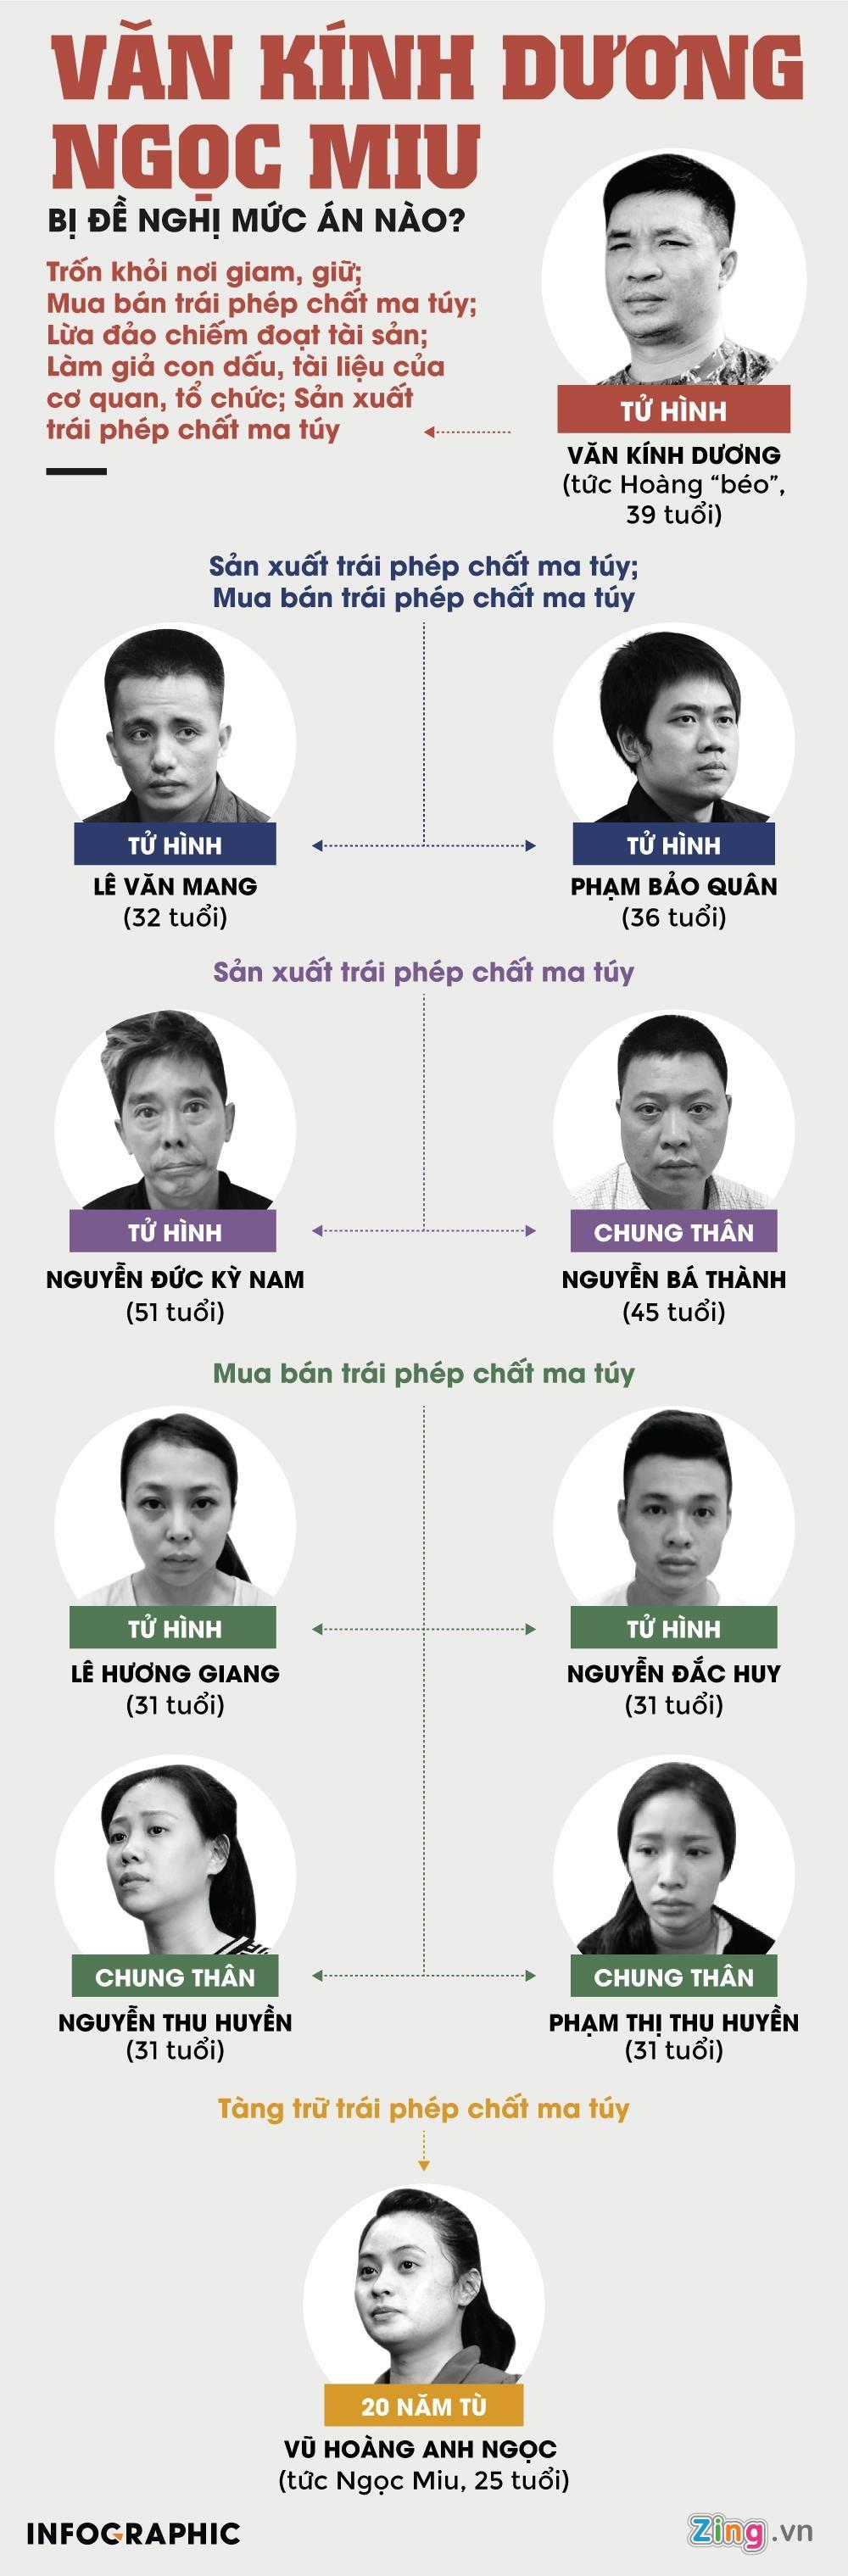 Van Kinh Duong va 5 tro thu bi de nghi an tu hinh hinh anh 1